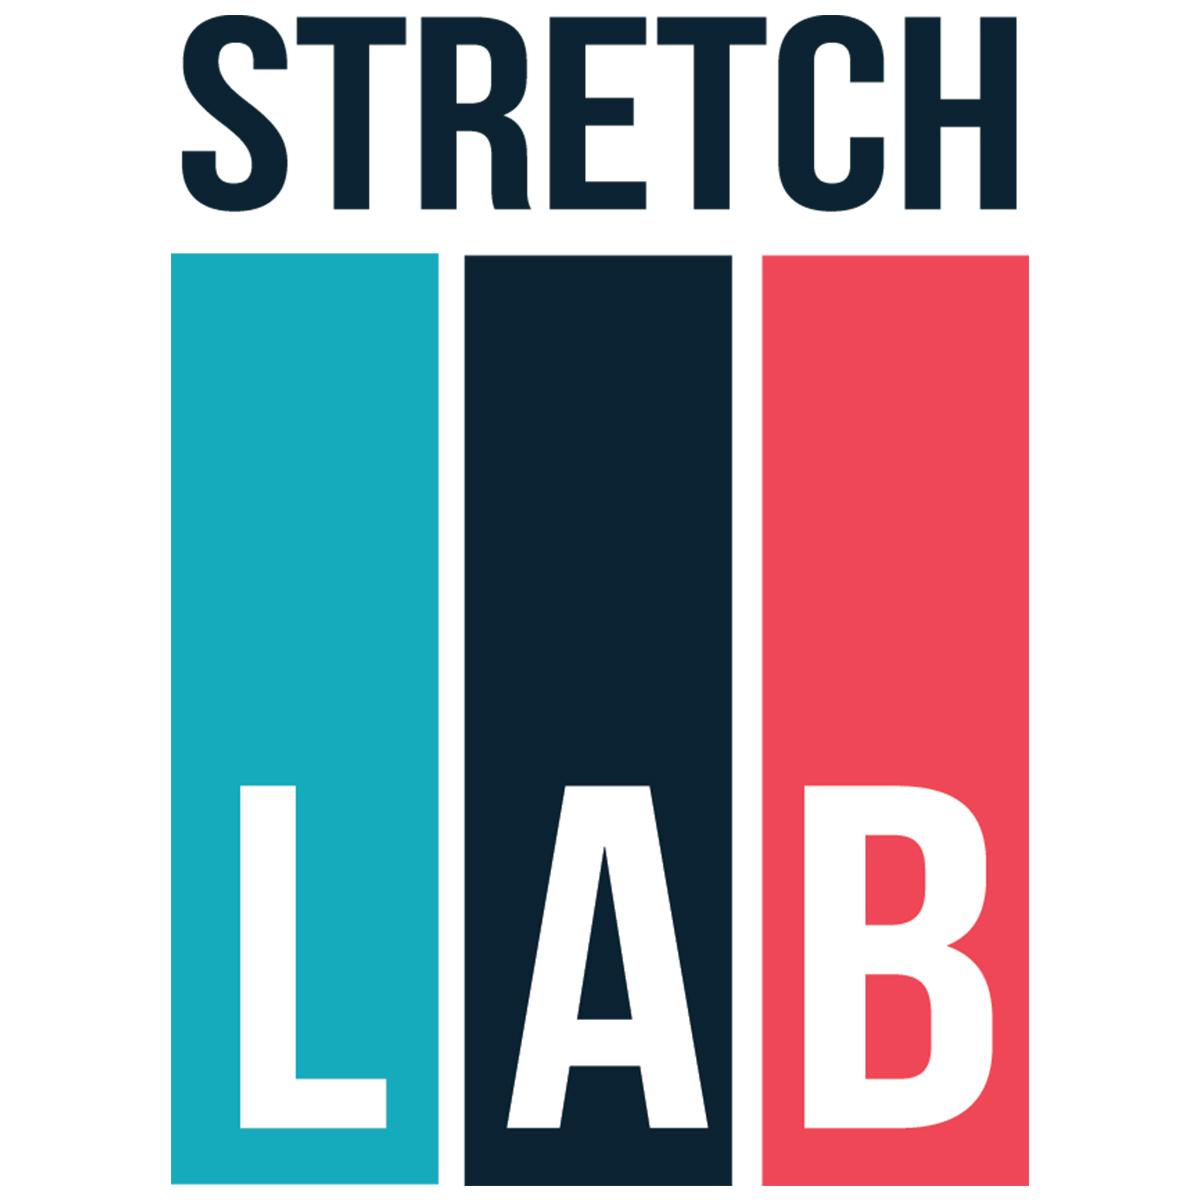 stretchlab.jpg